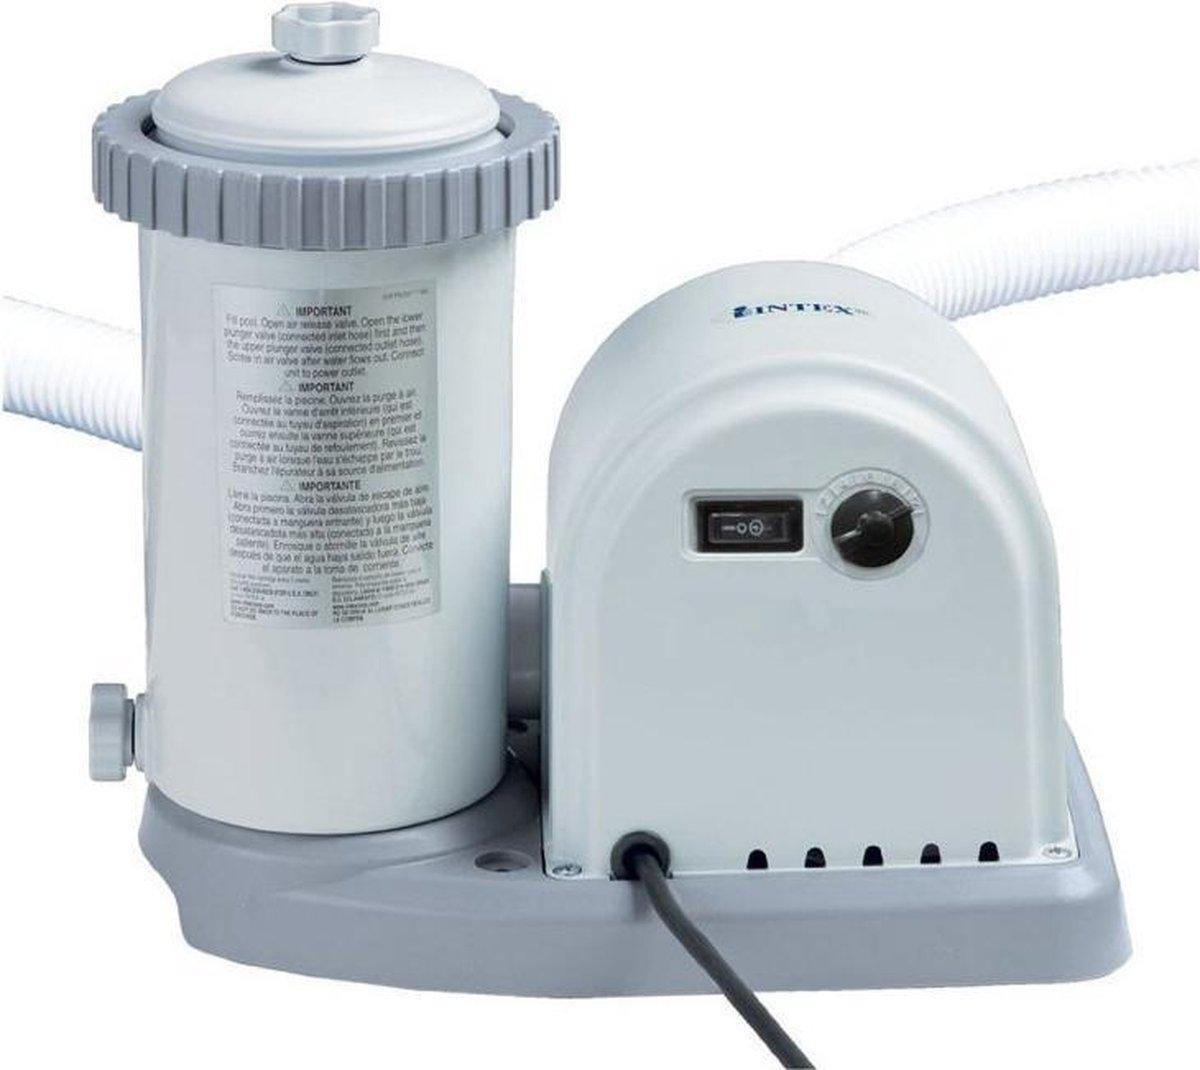 Intex Filterpomp 5678 L/u (28636gs)